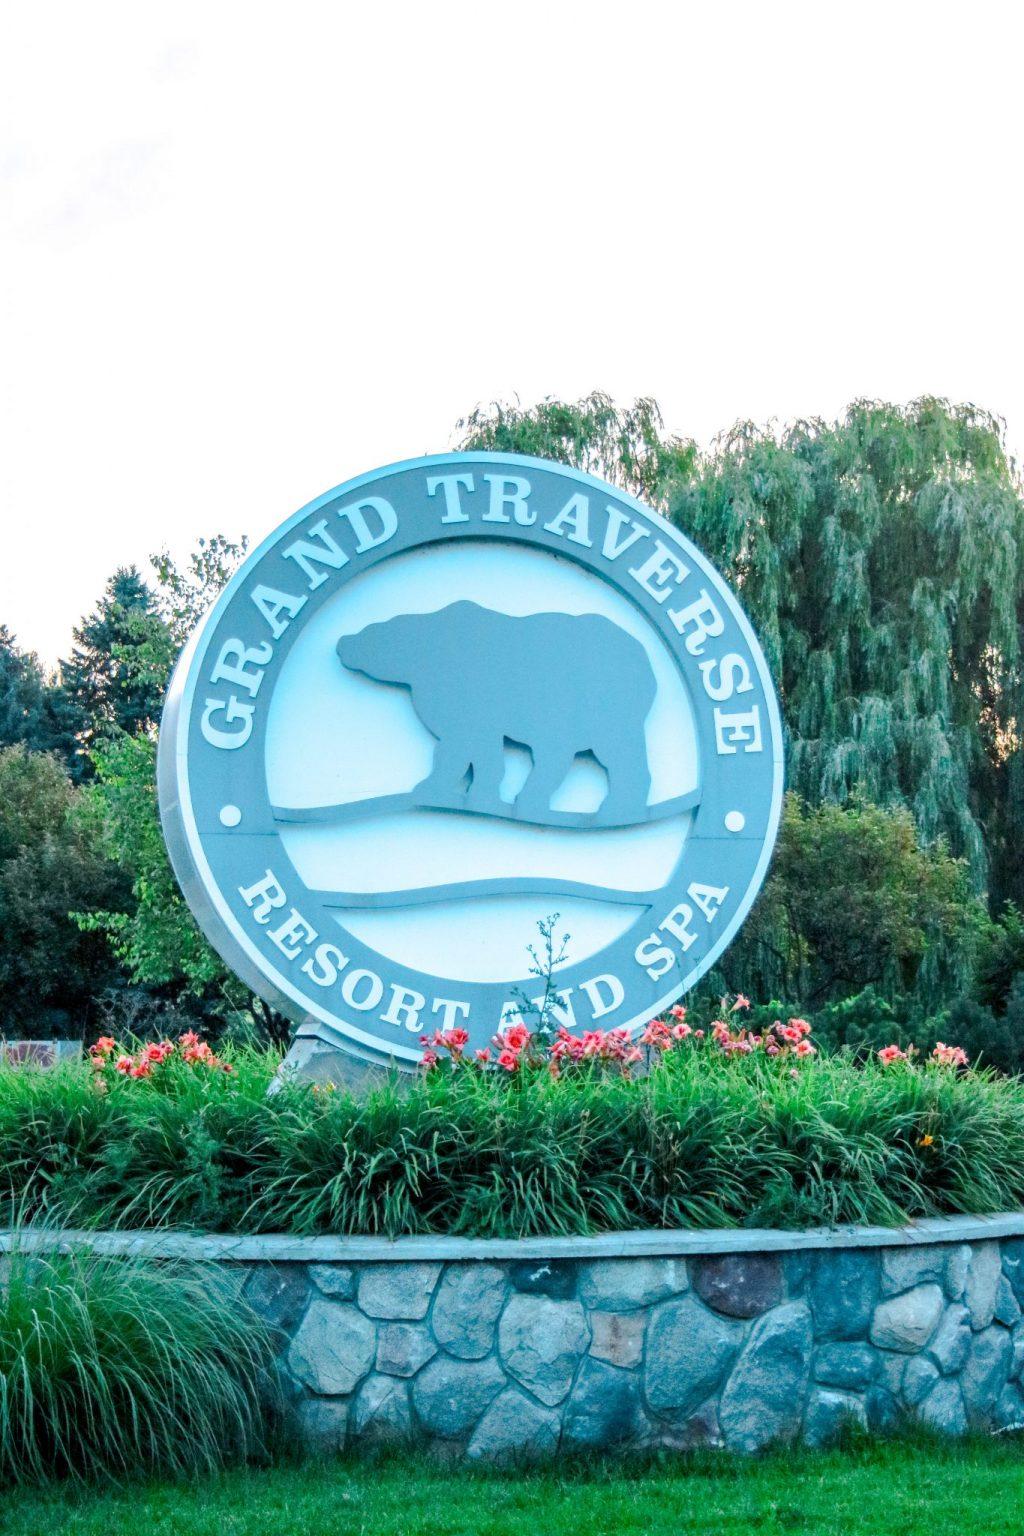 Traverse city resorts grand traverse resort and spa